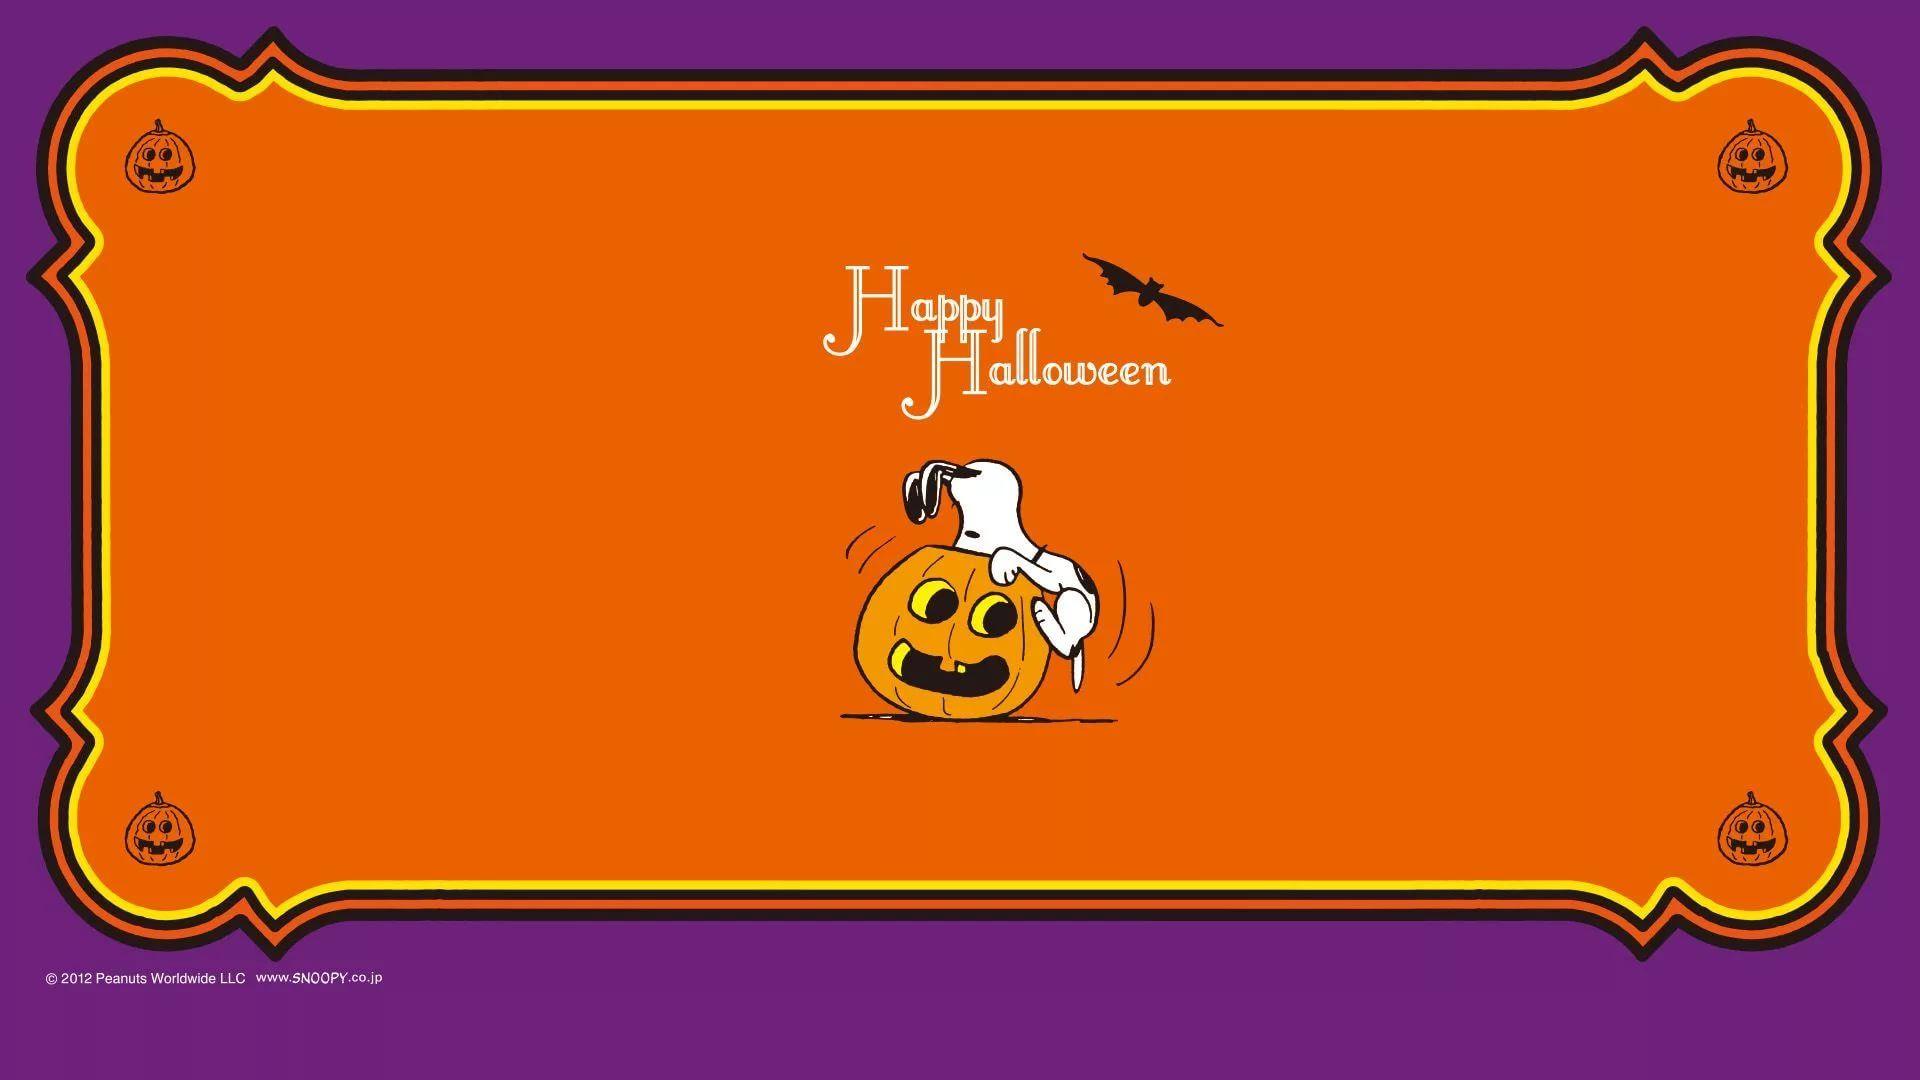 Snoopy Halloween hd desktop wallpaper